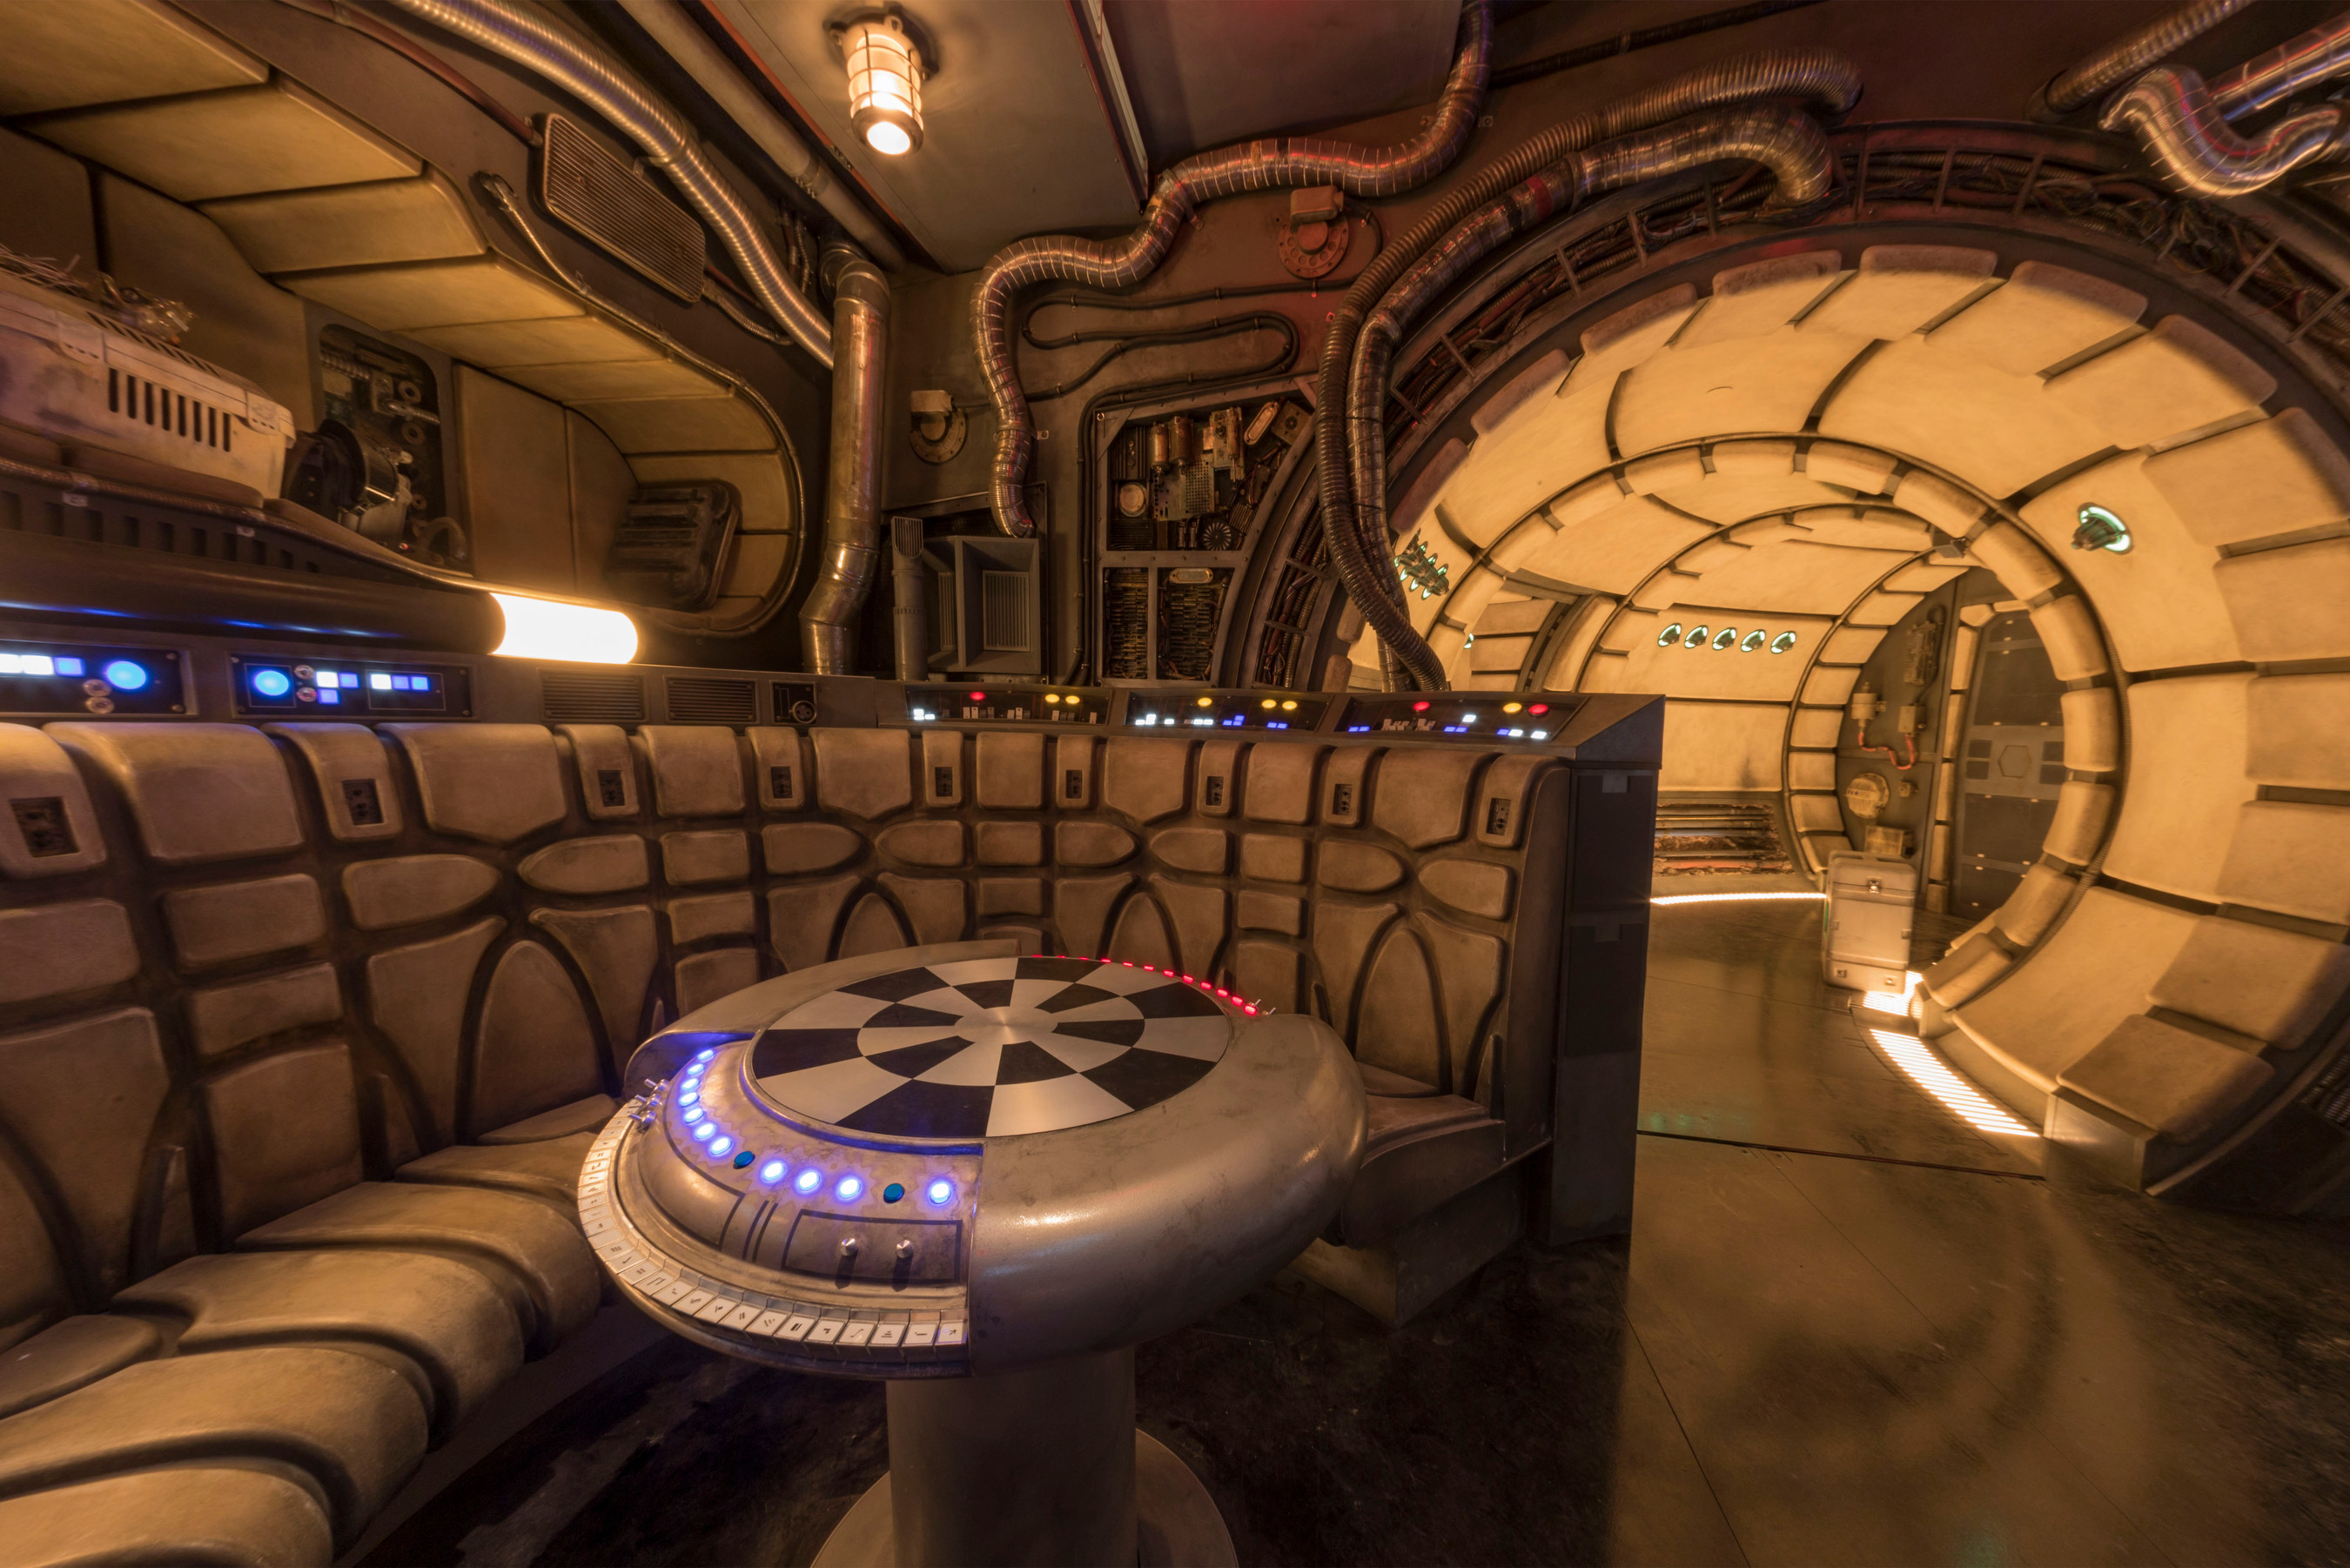 Inside the Millenium Falcon: Smuggler's Run attraction in Galaxy's Edge